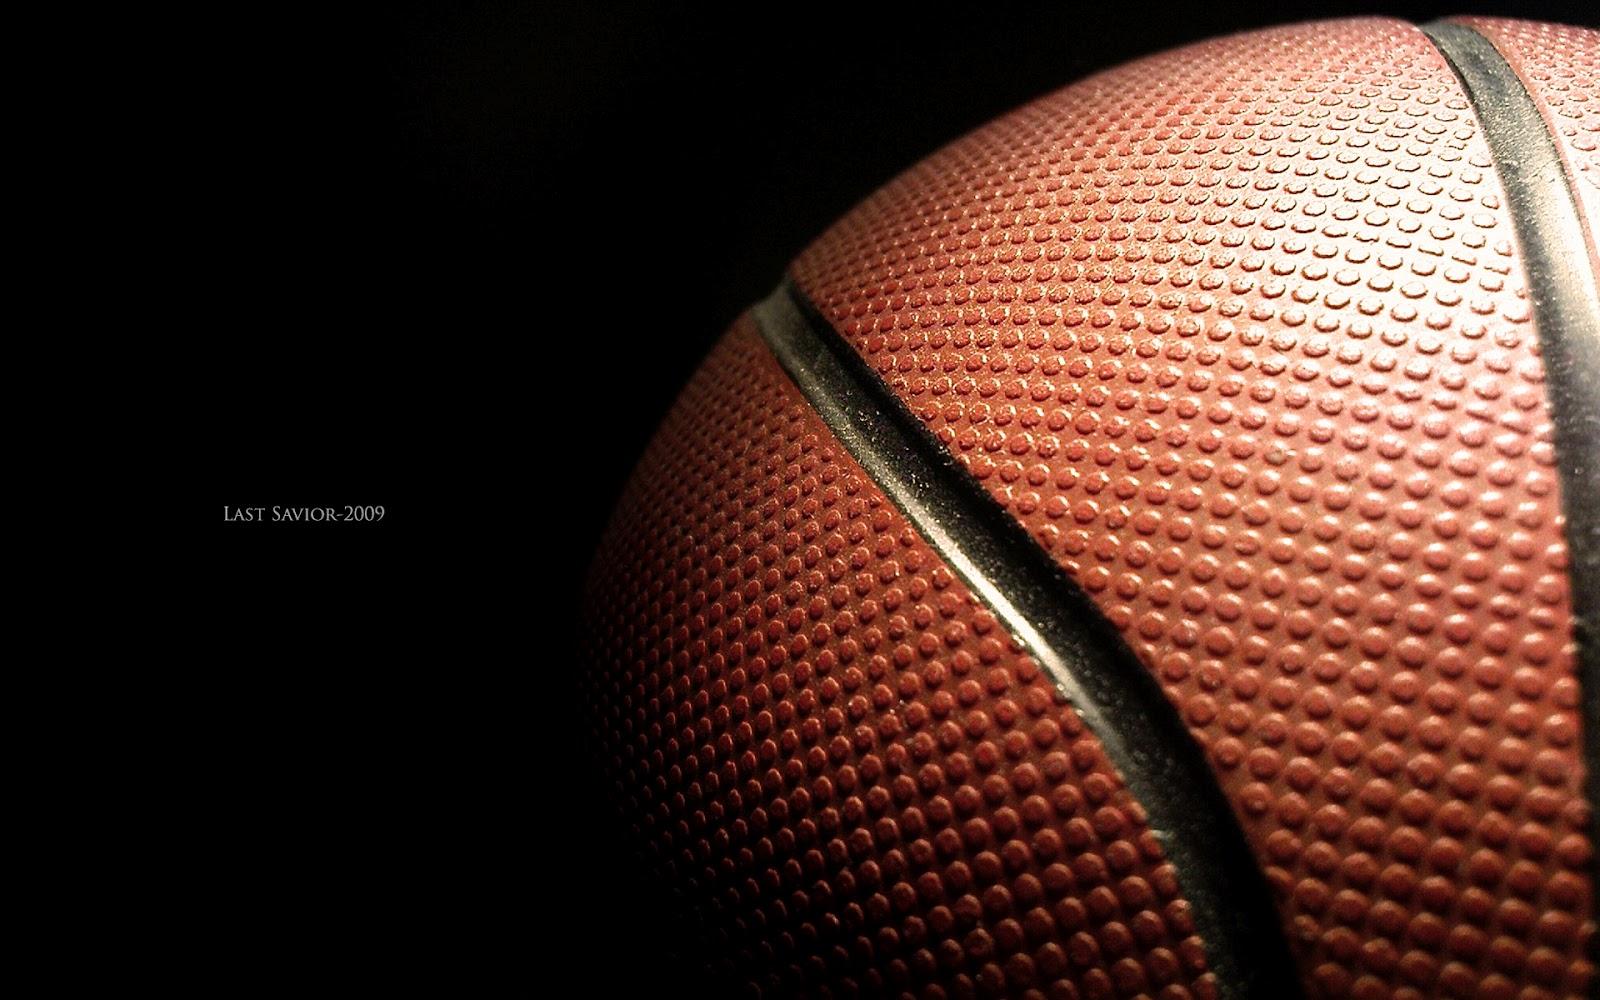 Fondos Wallpapers Hd: Wallpapers HD: Basket Ball Wallpapers HD